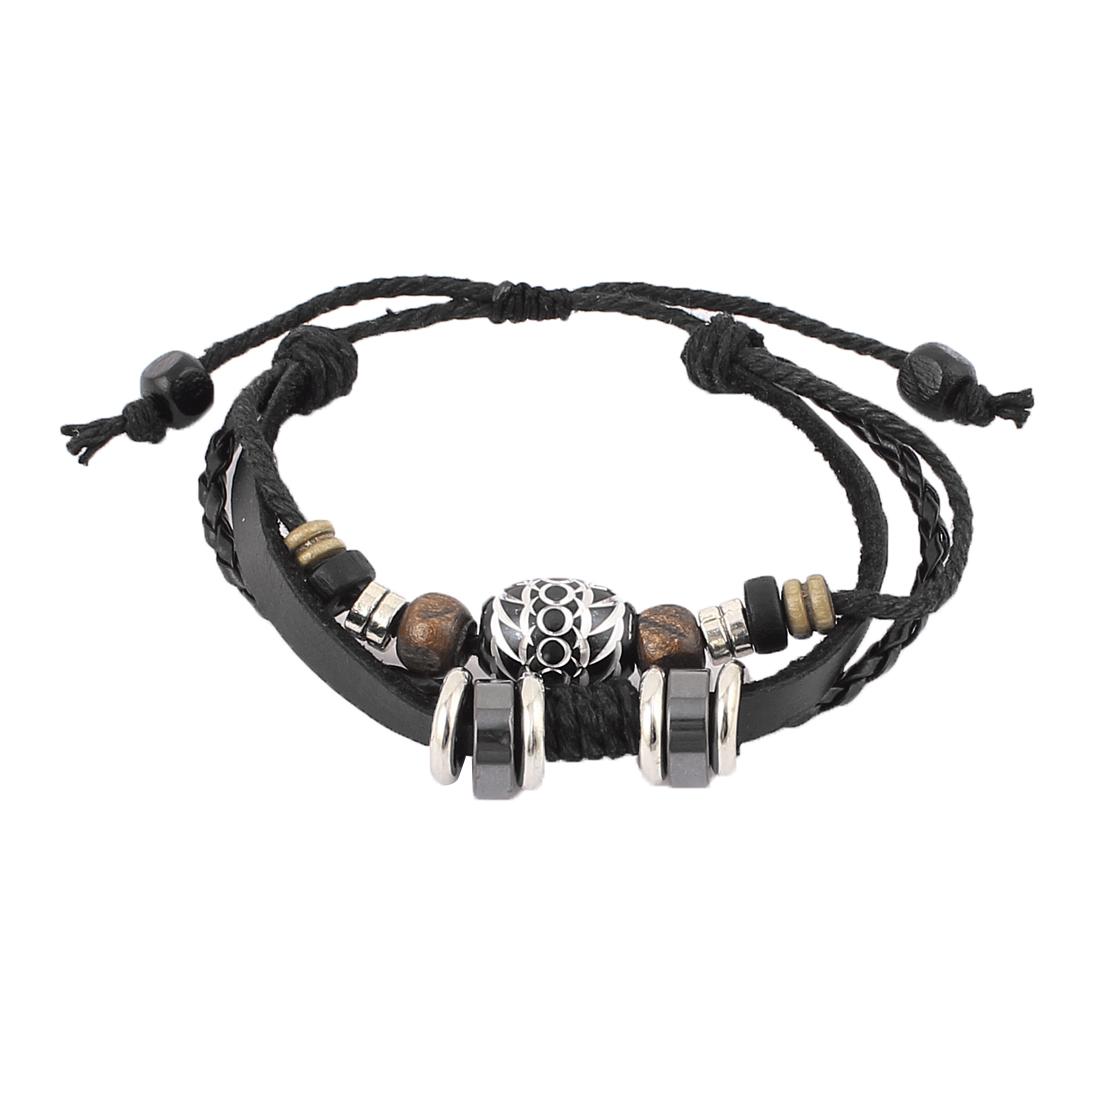 Punk Rocker Beads Pendant Faux Leather Band Wax Cord String Charm Wrap Wristband Bracelet Bangle